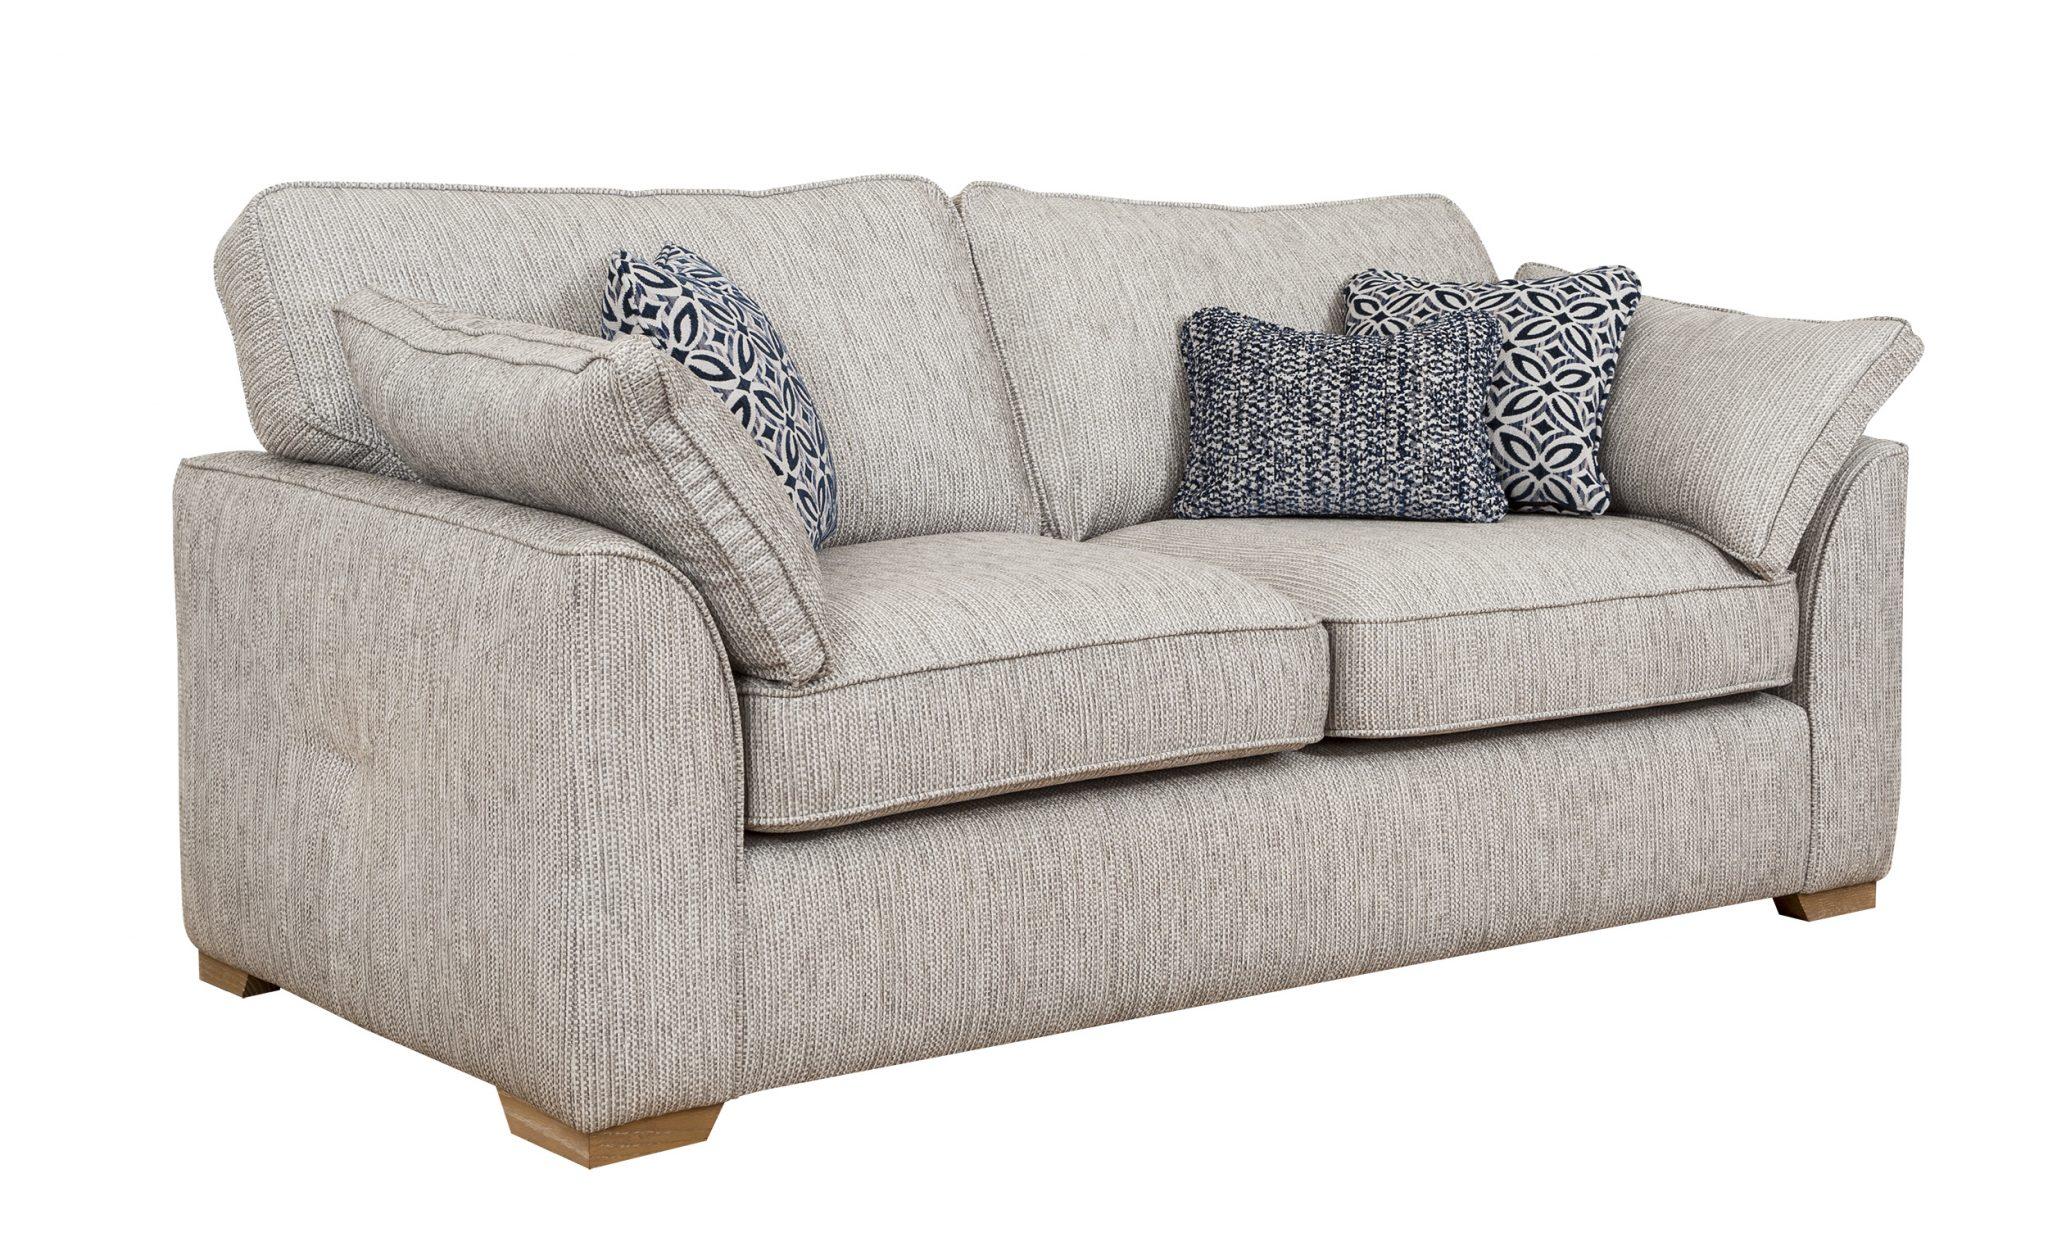 The Quinn Sofa Sofas Amp Furniture I Knees Trowbridge